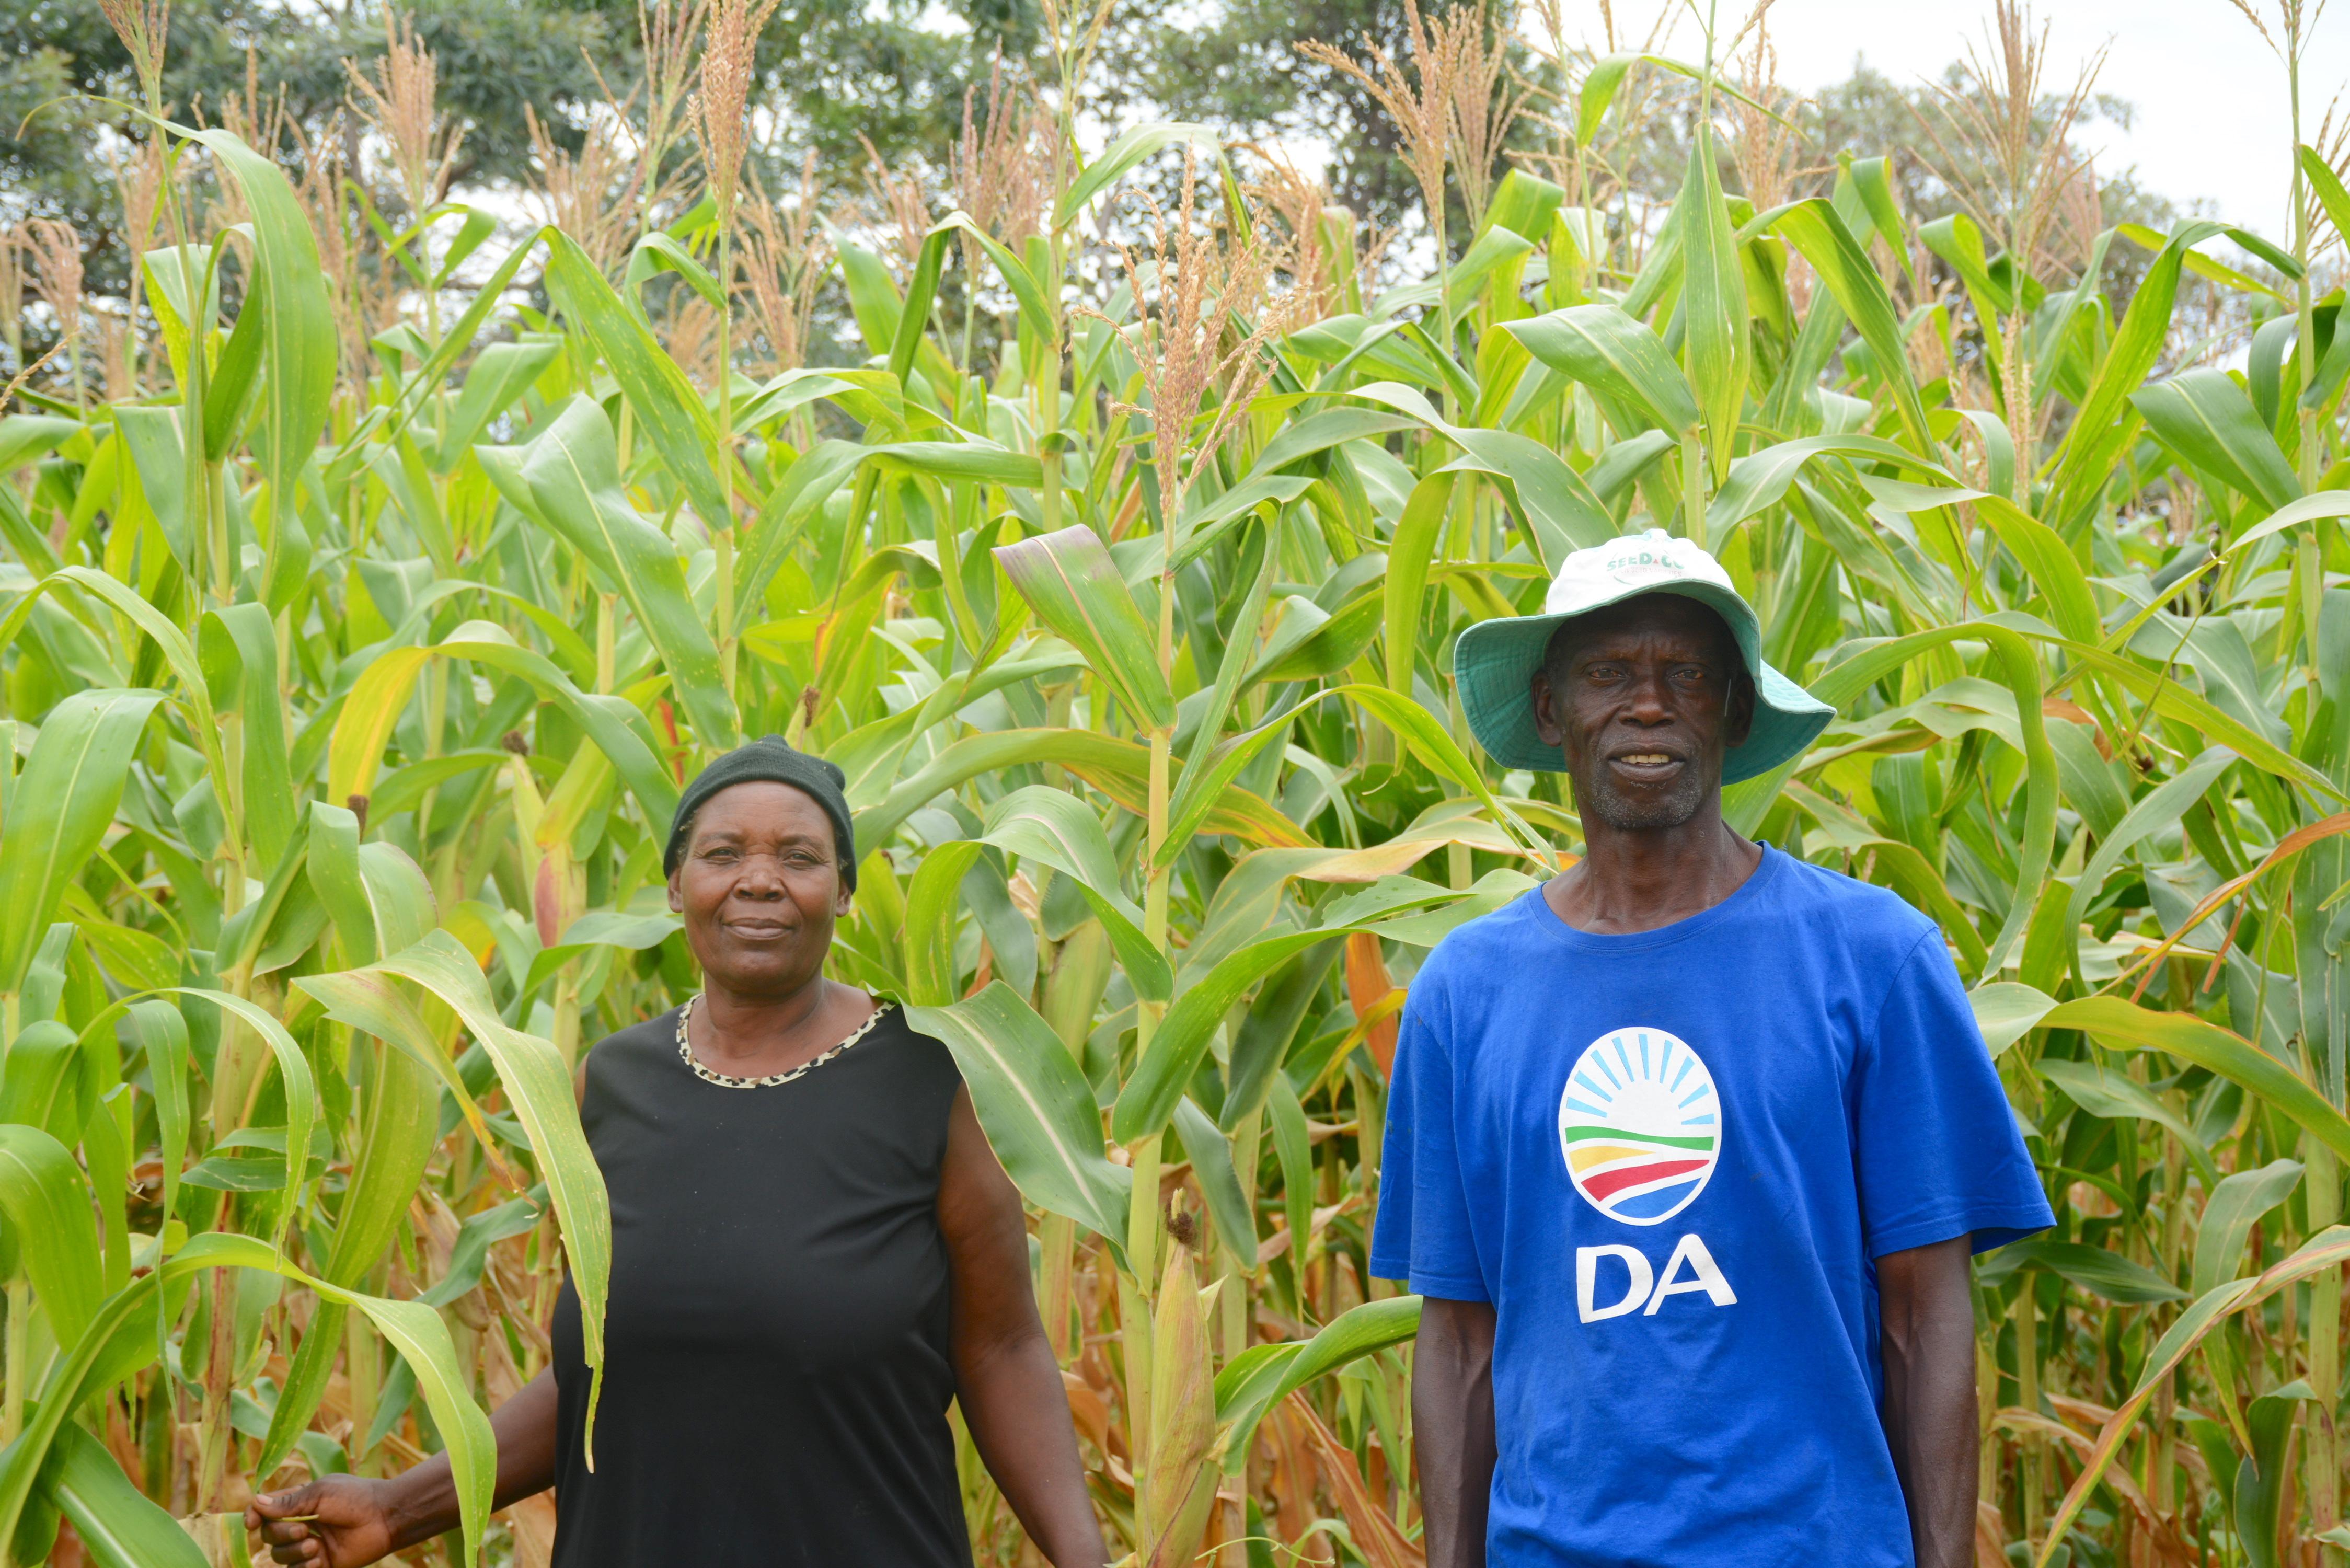 Netsai Garwe (left) and Cosmas Garwe in their maize field, Ward 4, Murewa district, Zimbabwe. (Photo: Shiela Chikulo/CIMMYT)